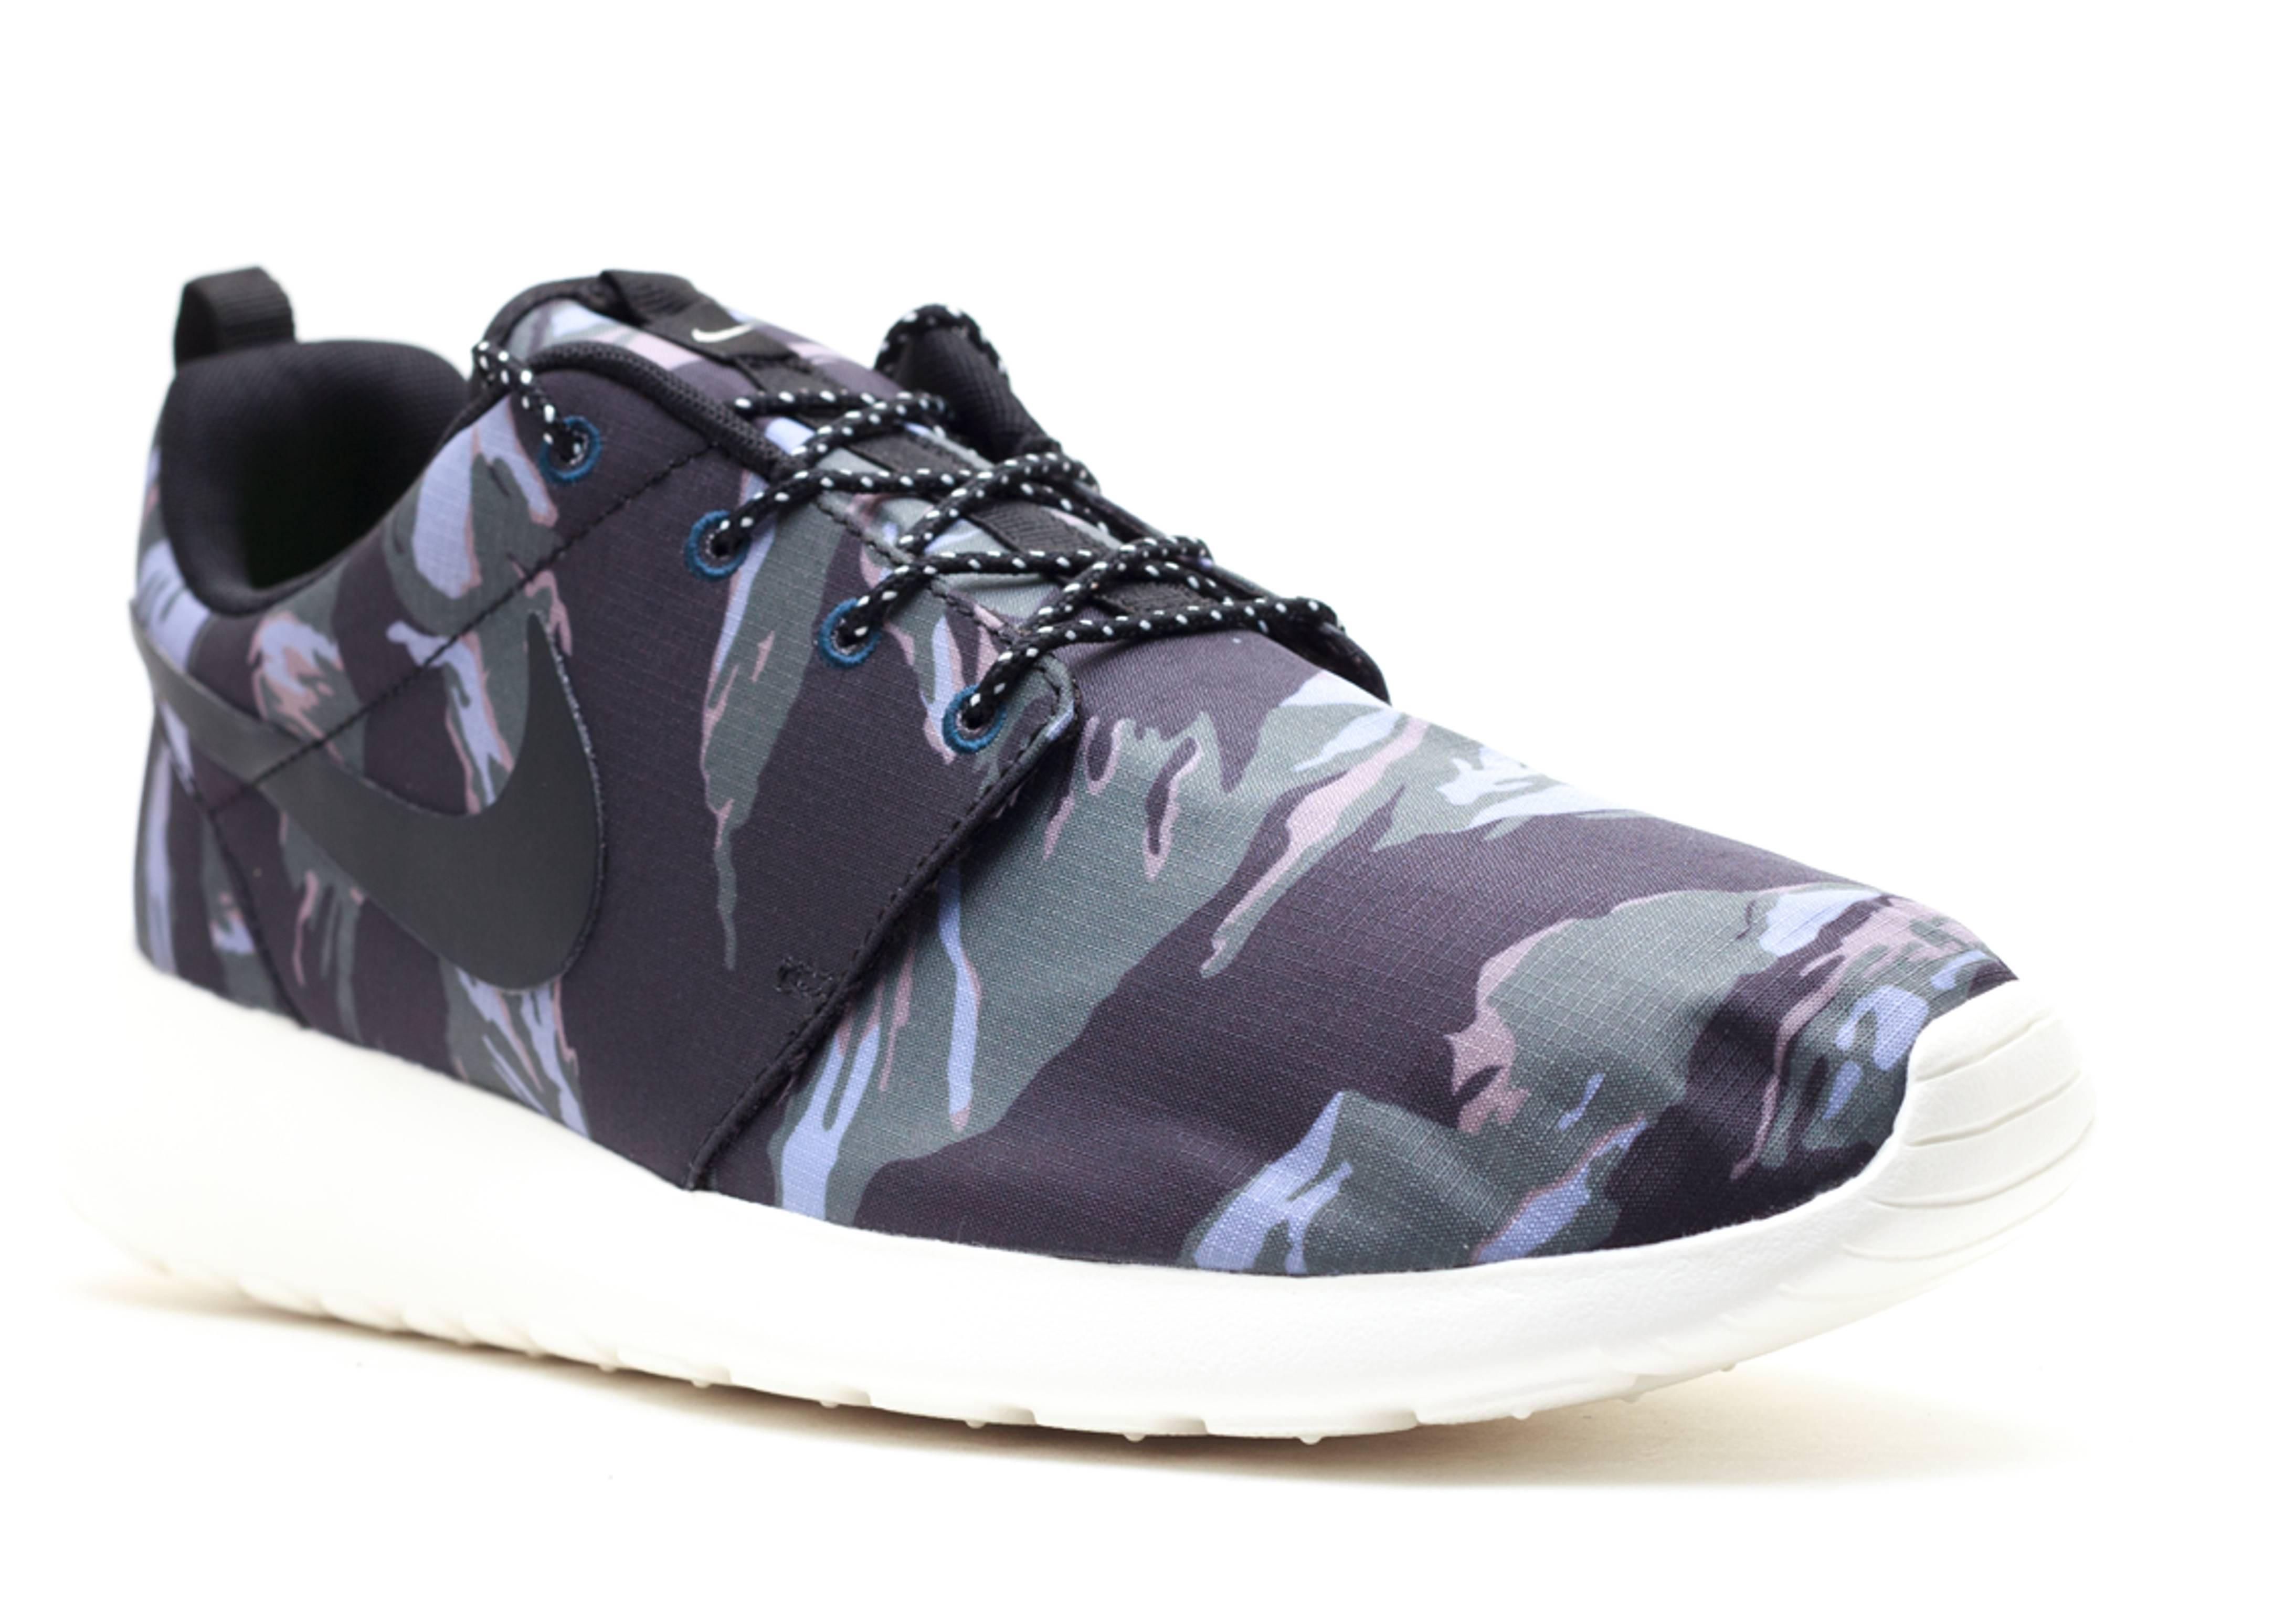 Nike Roshe Run NM FB 'Camo' First Look WearTesters